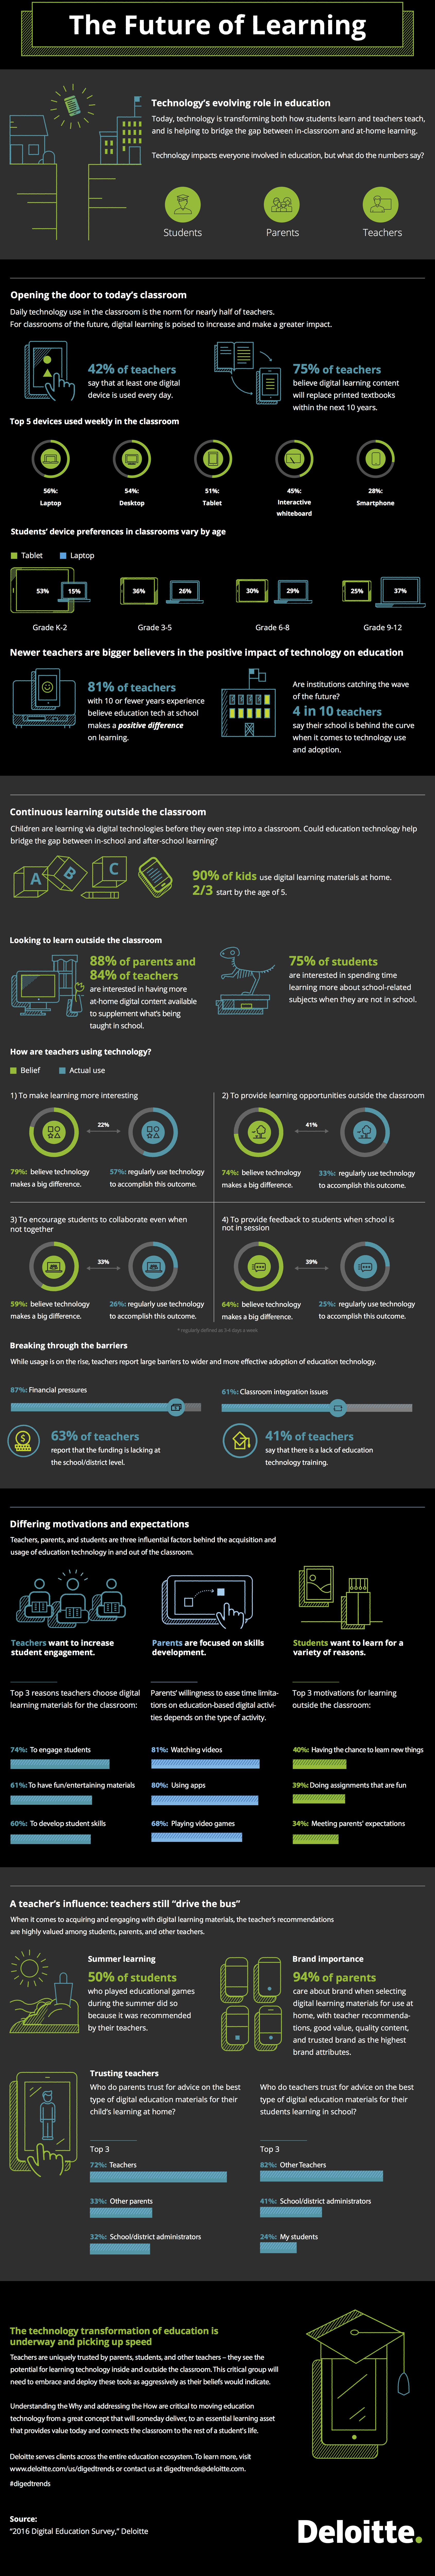 Infographic Digital Education Survey